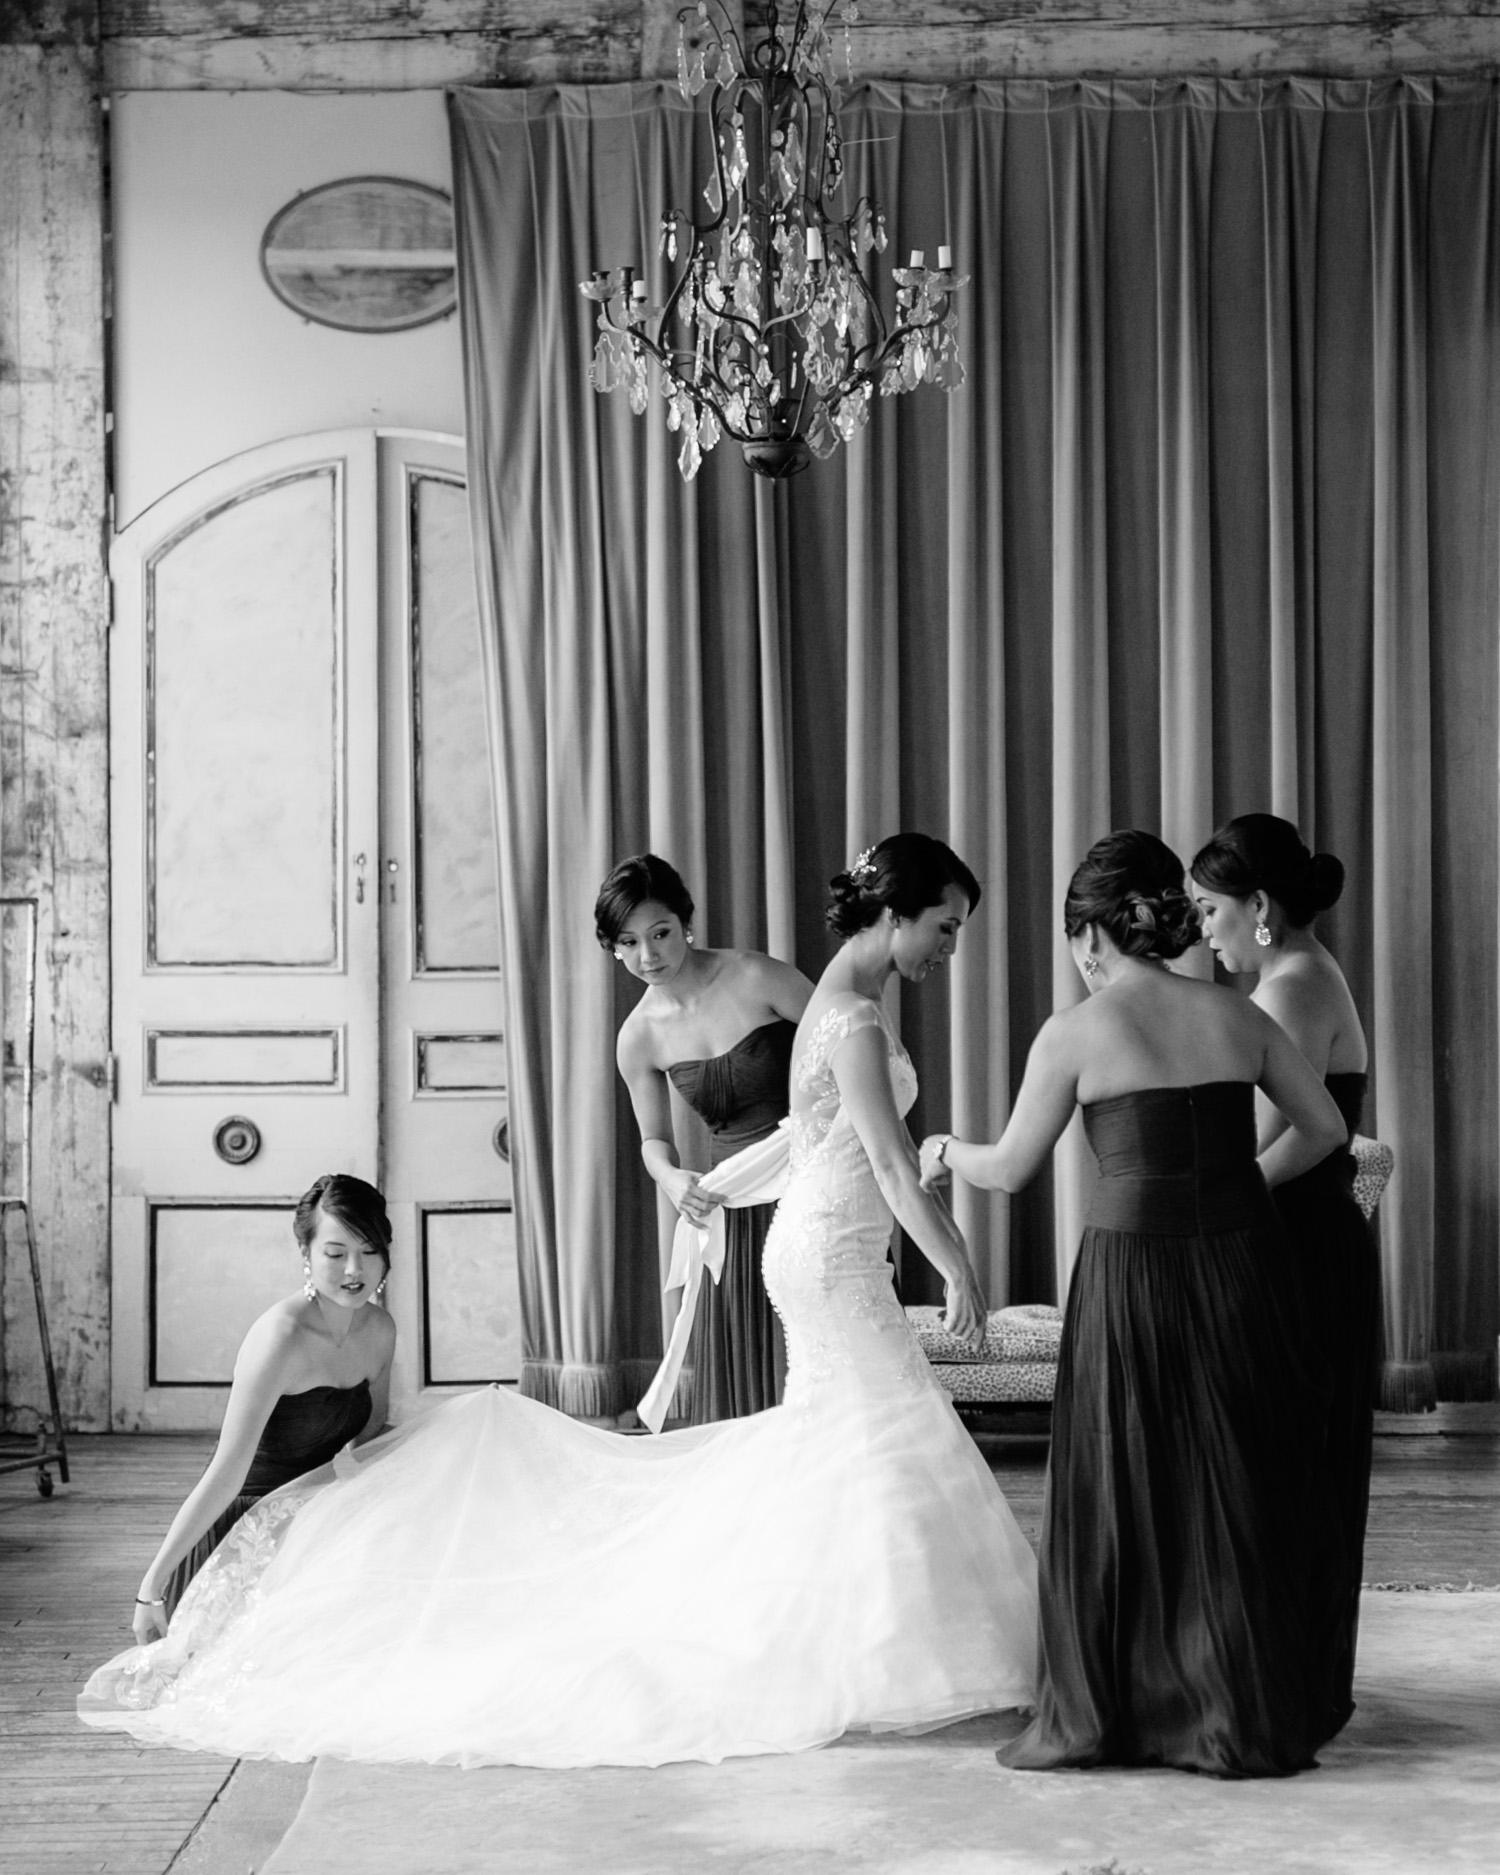 Metropolitan Building Wedding Queens, NY - Jessica & Tony x The Gathering Season 019.jpg